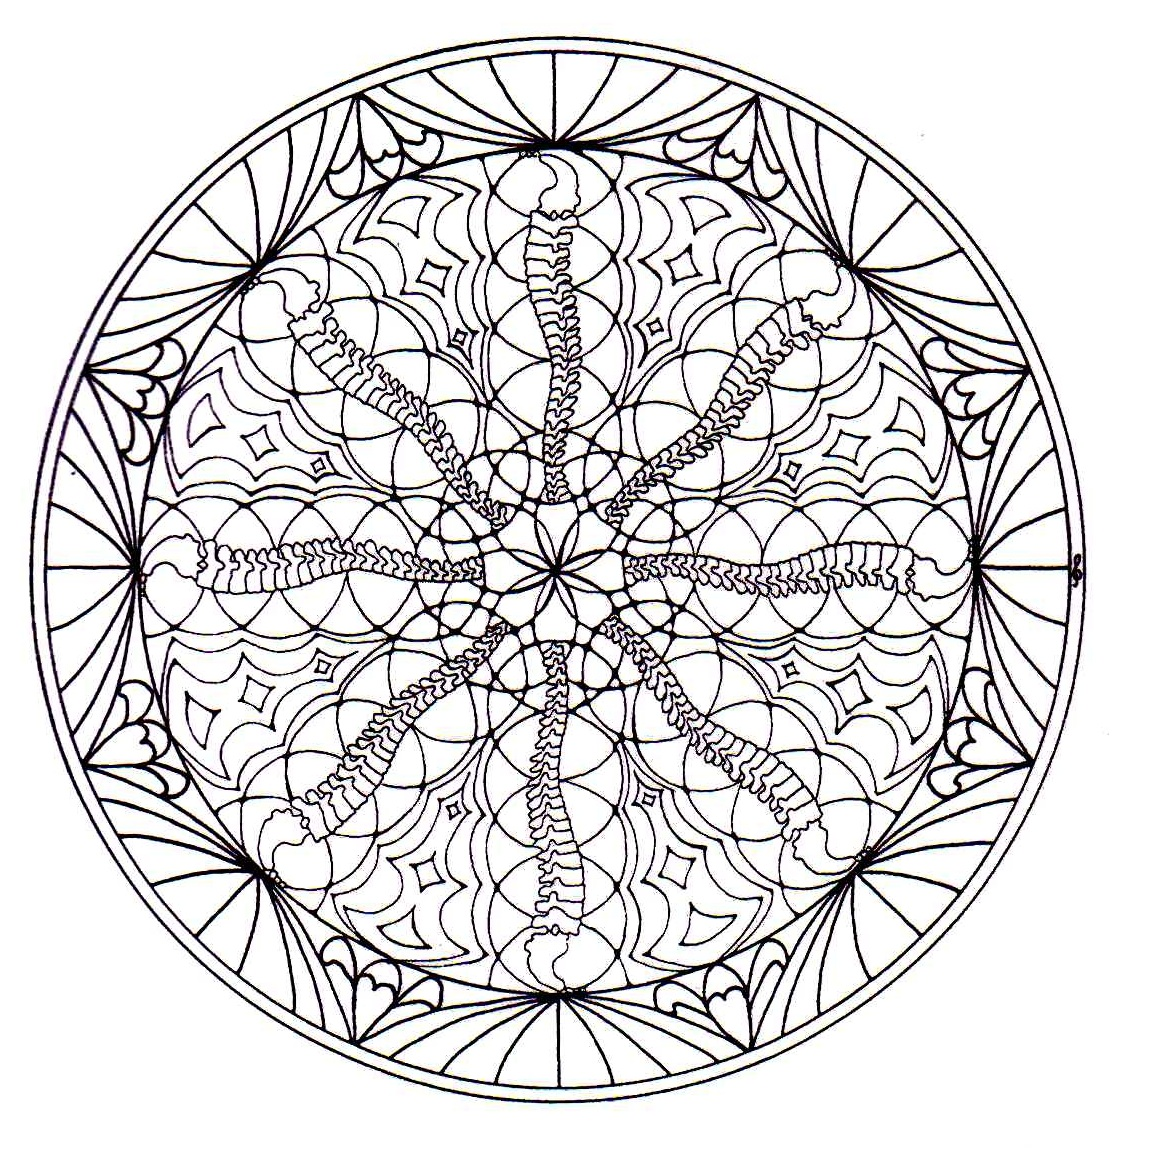 Mandala To Color Flowers Vegetation To Print 9